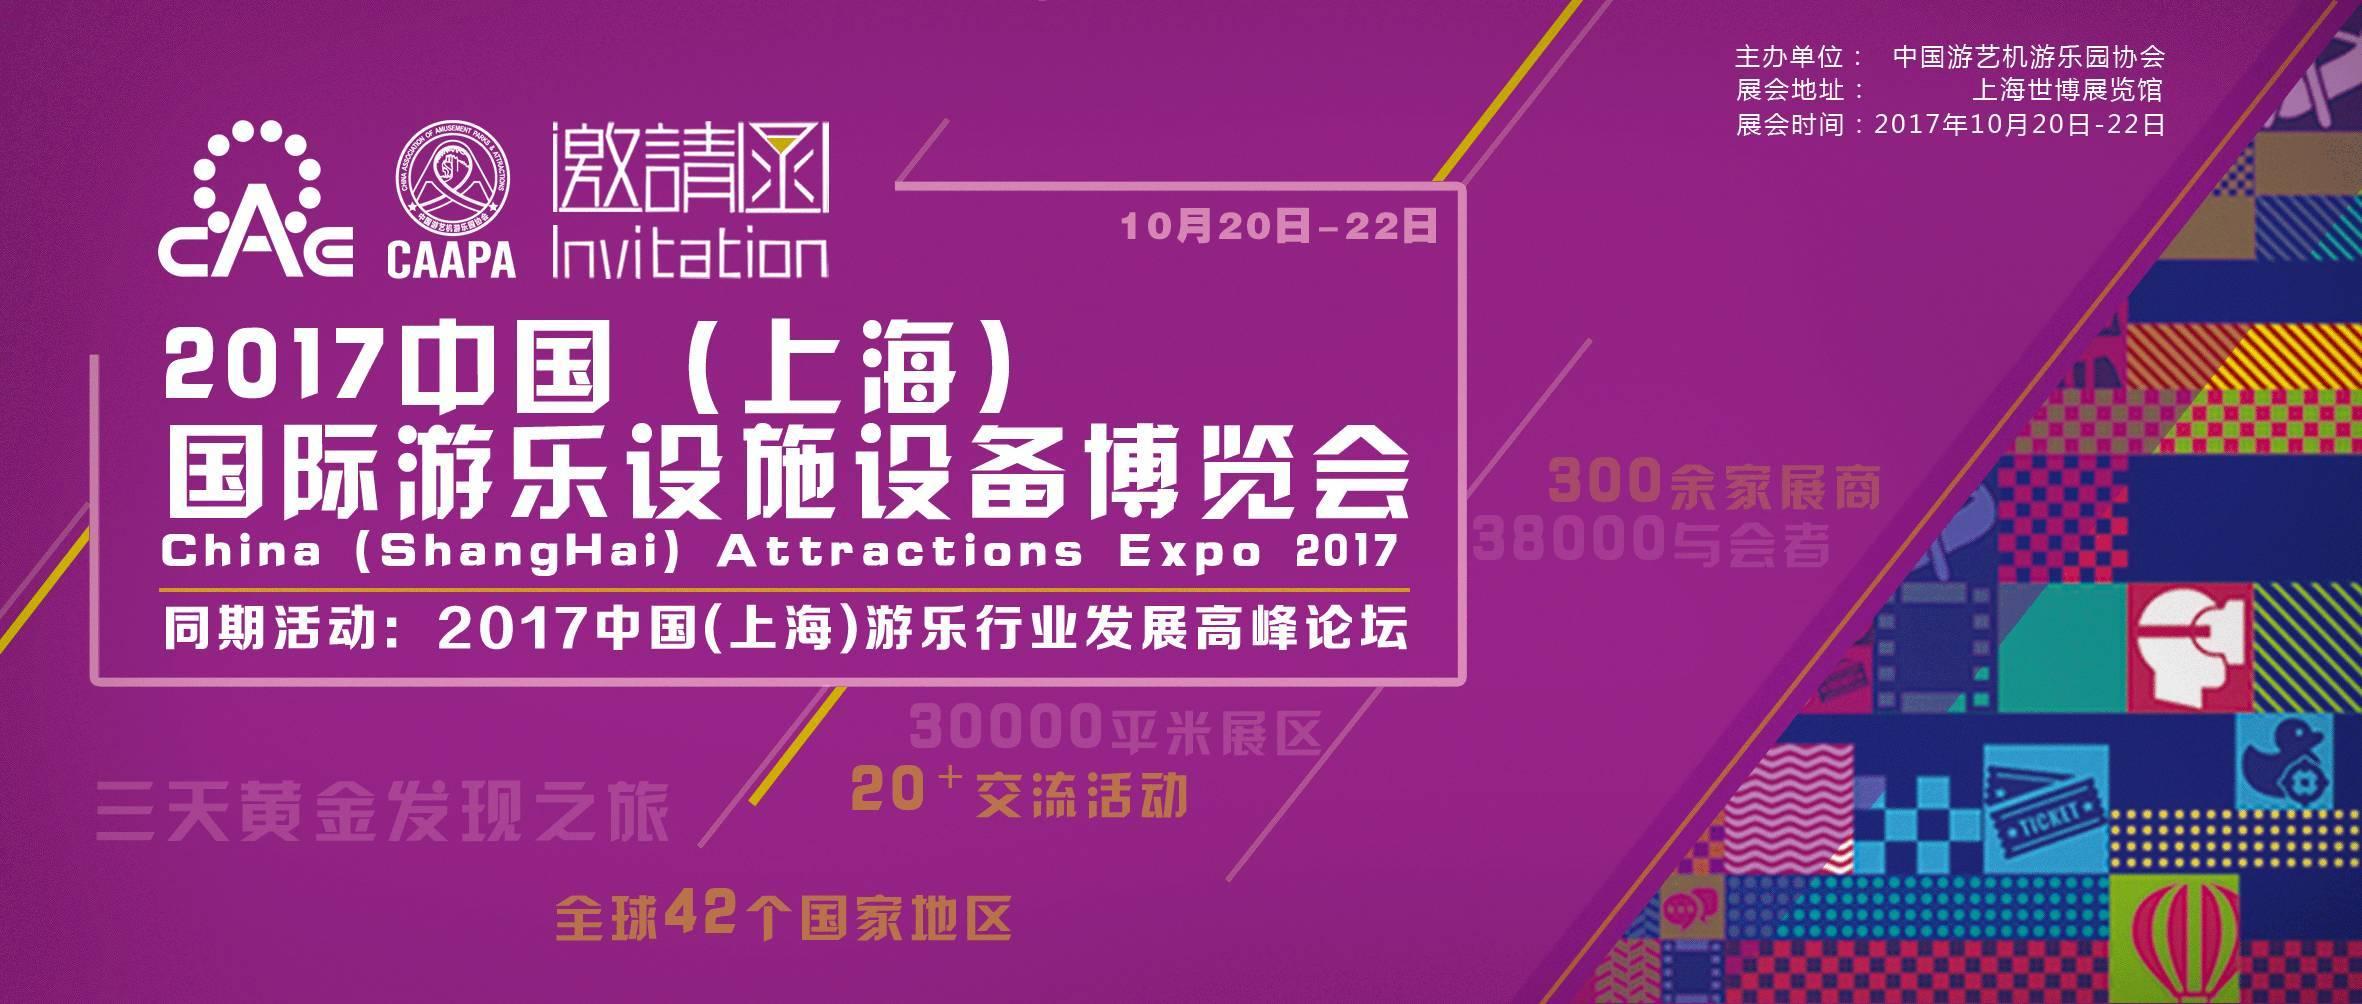 2017CAE上海展丨新道信中国邀您参观[1501]展位